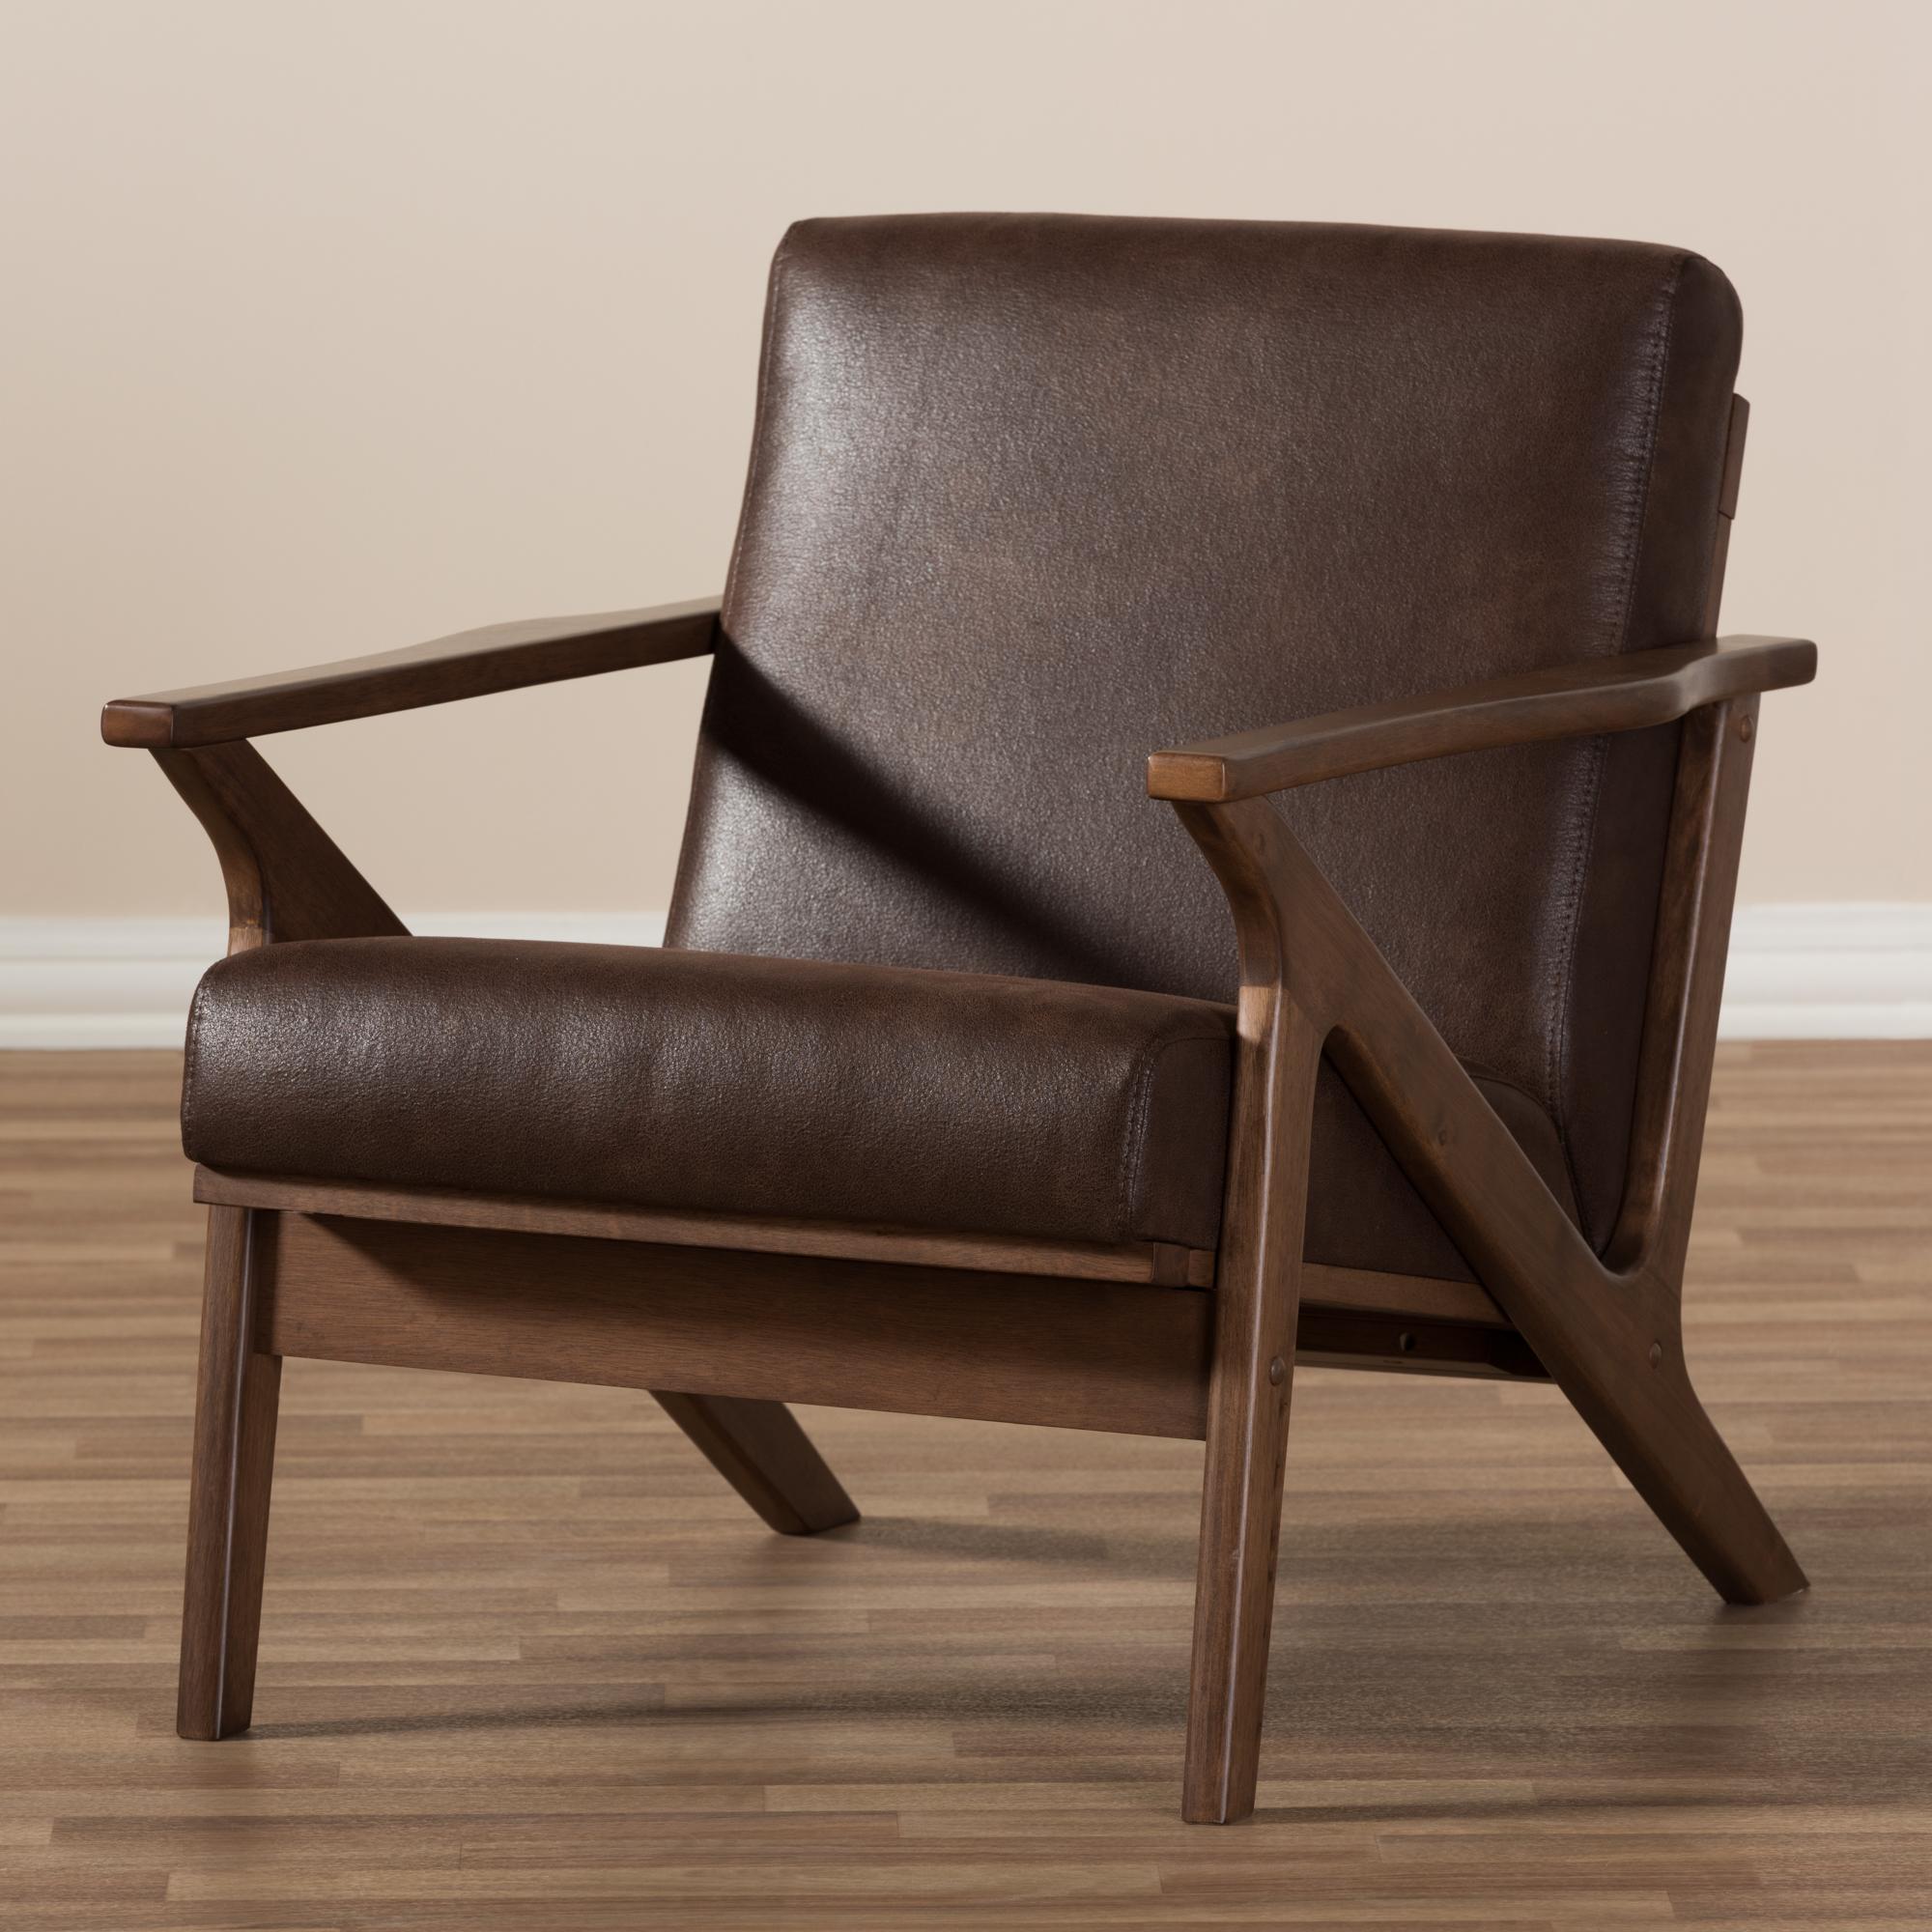 Merveilleux ... Baxton Studio Bianca Mid Century Modern Walnut Wood Dark Brown  Distressed Faux Leather Lounge Chair ...